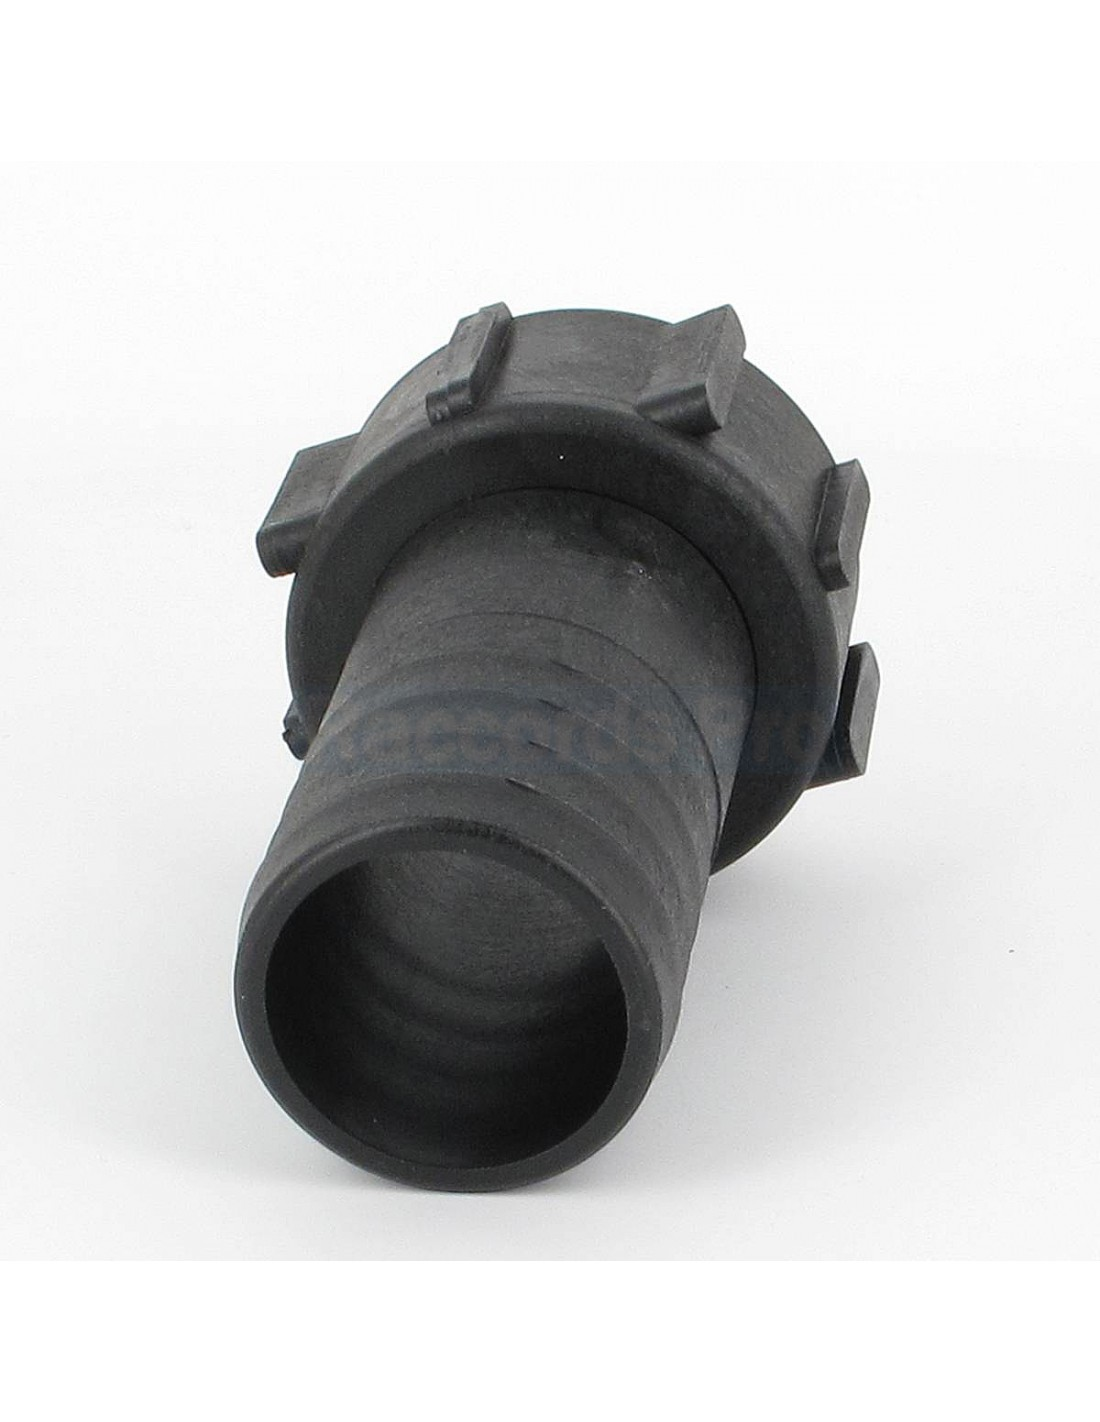 raccord cannel droit crou 50mm f 2 nps sarl axesspack. Black Bedroom Furniture Sets. Home Design Ideas